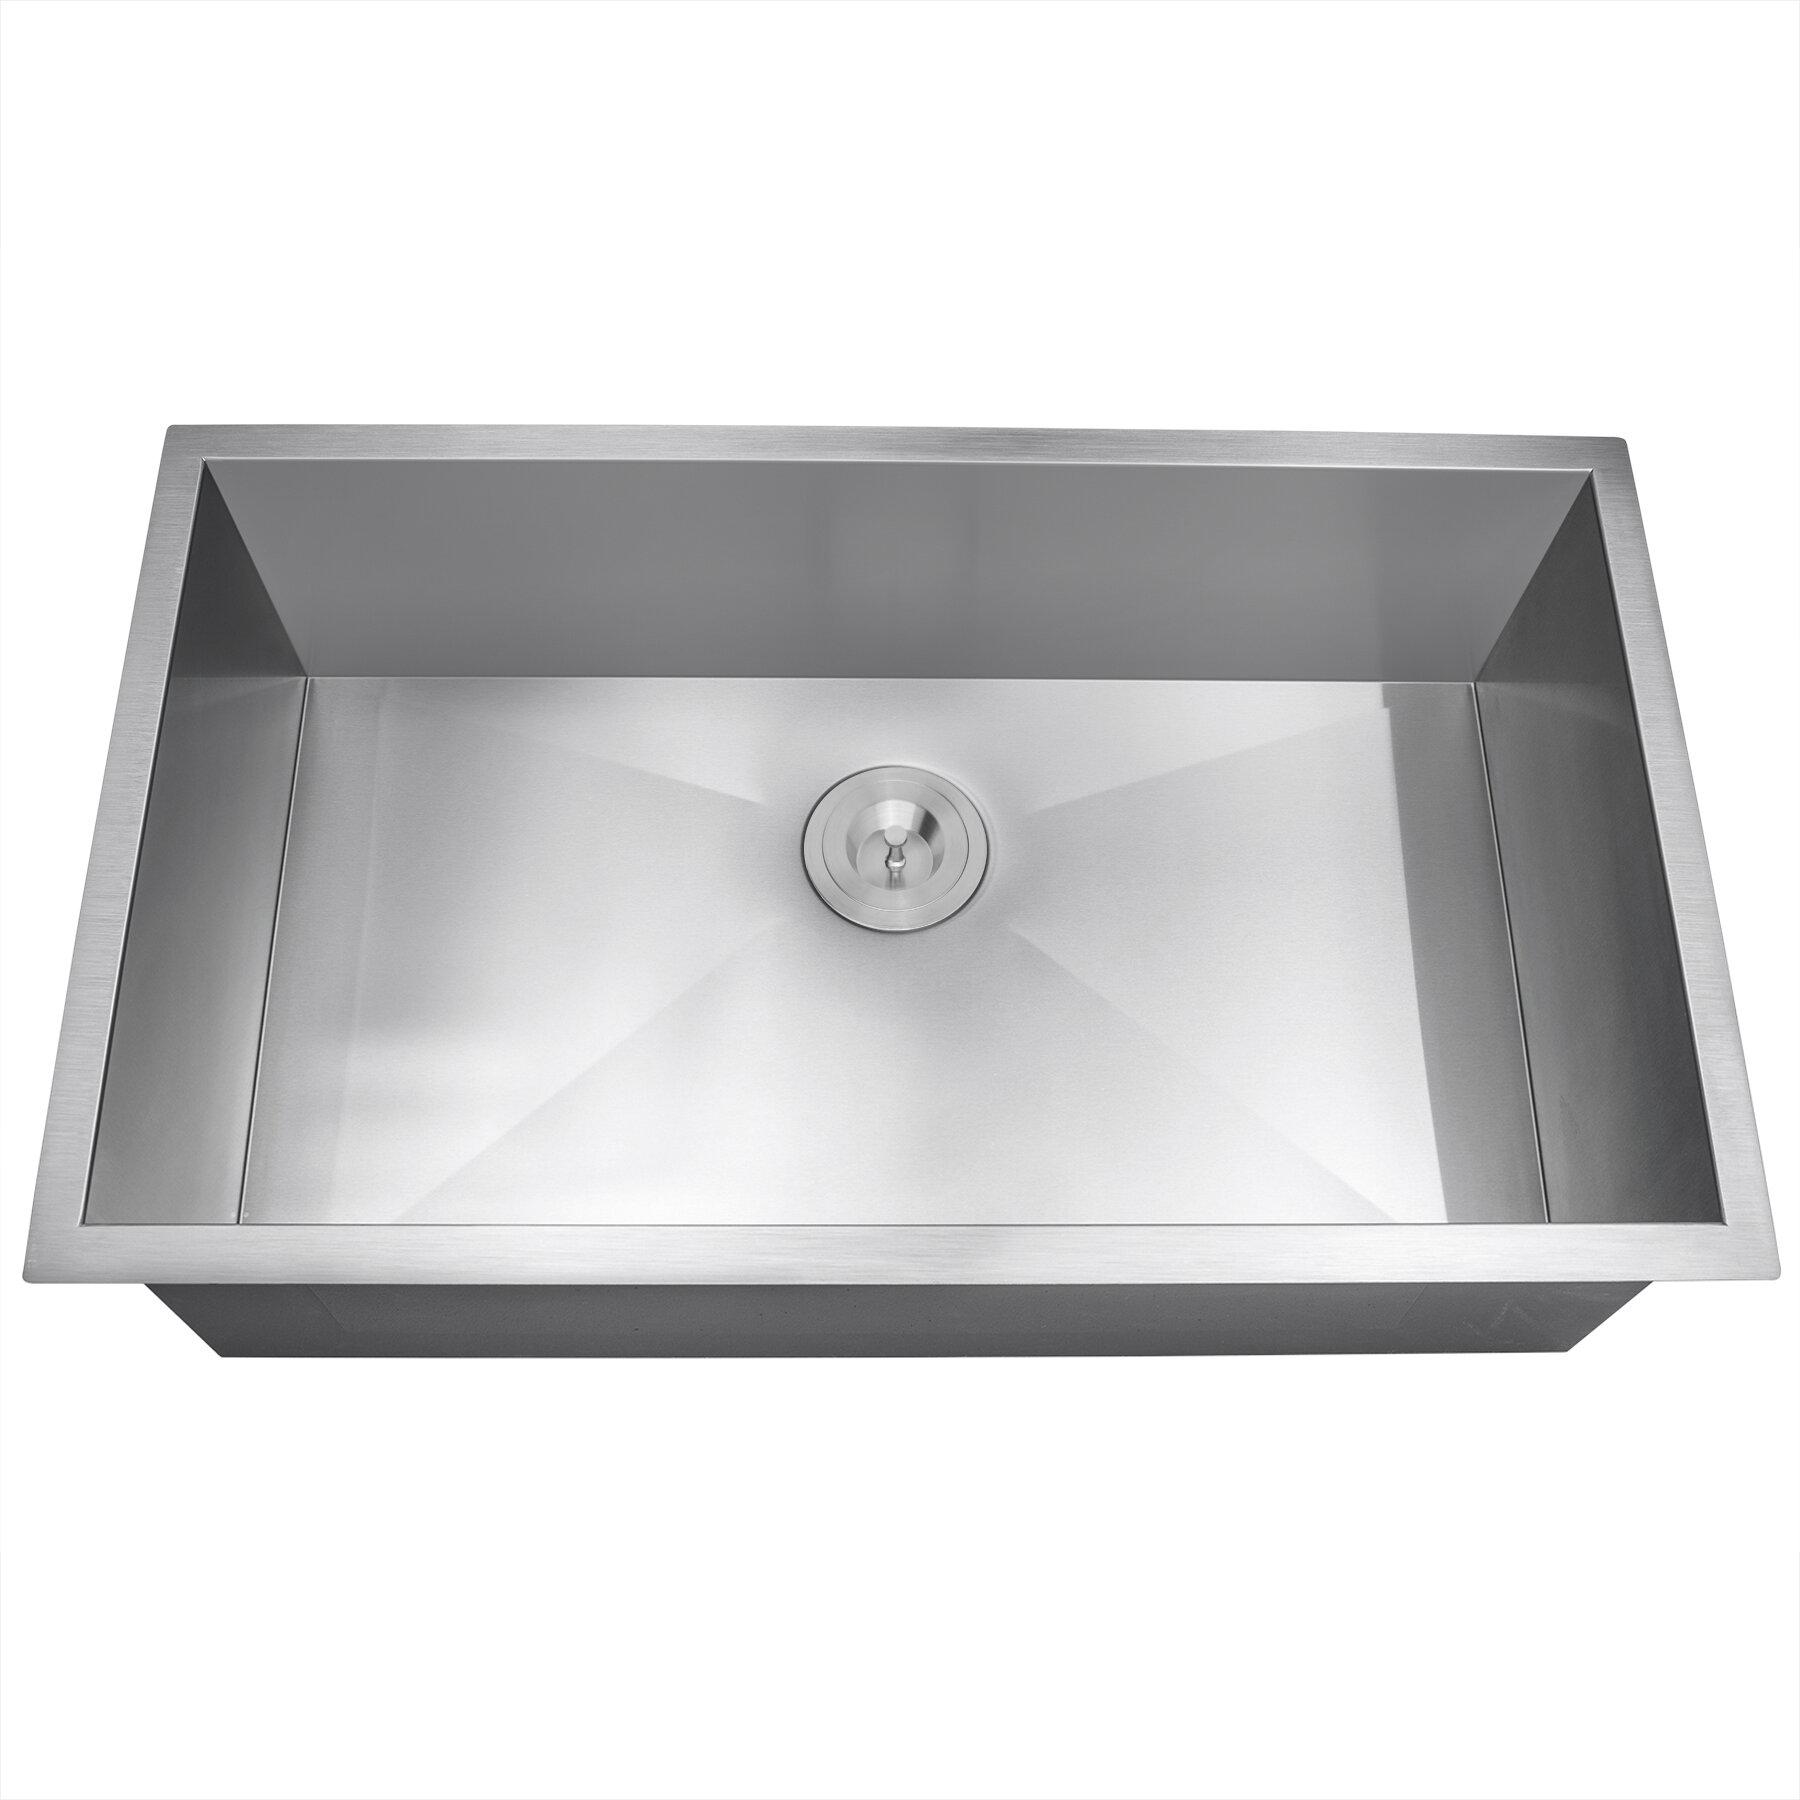 Akdy 33 X 22 Undermount Stainless Steel Single Bowl Kitchen Sink W